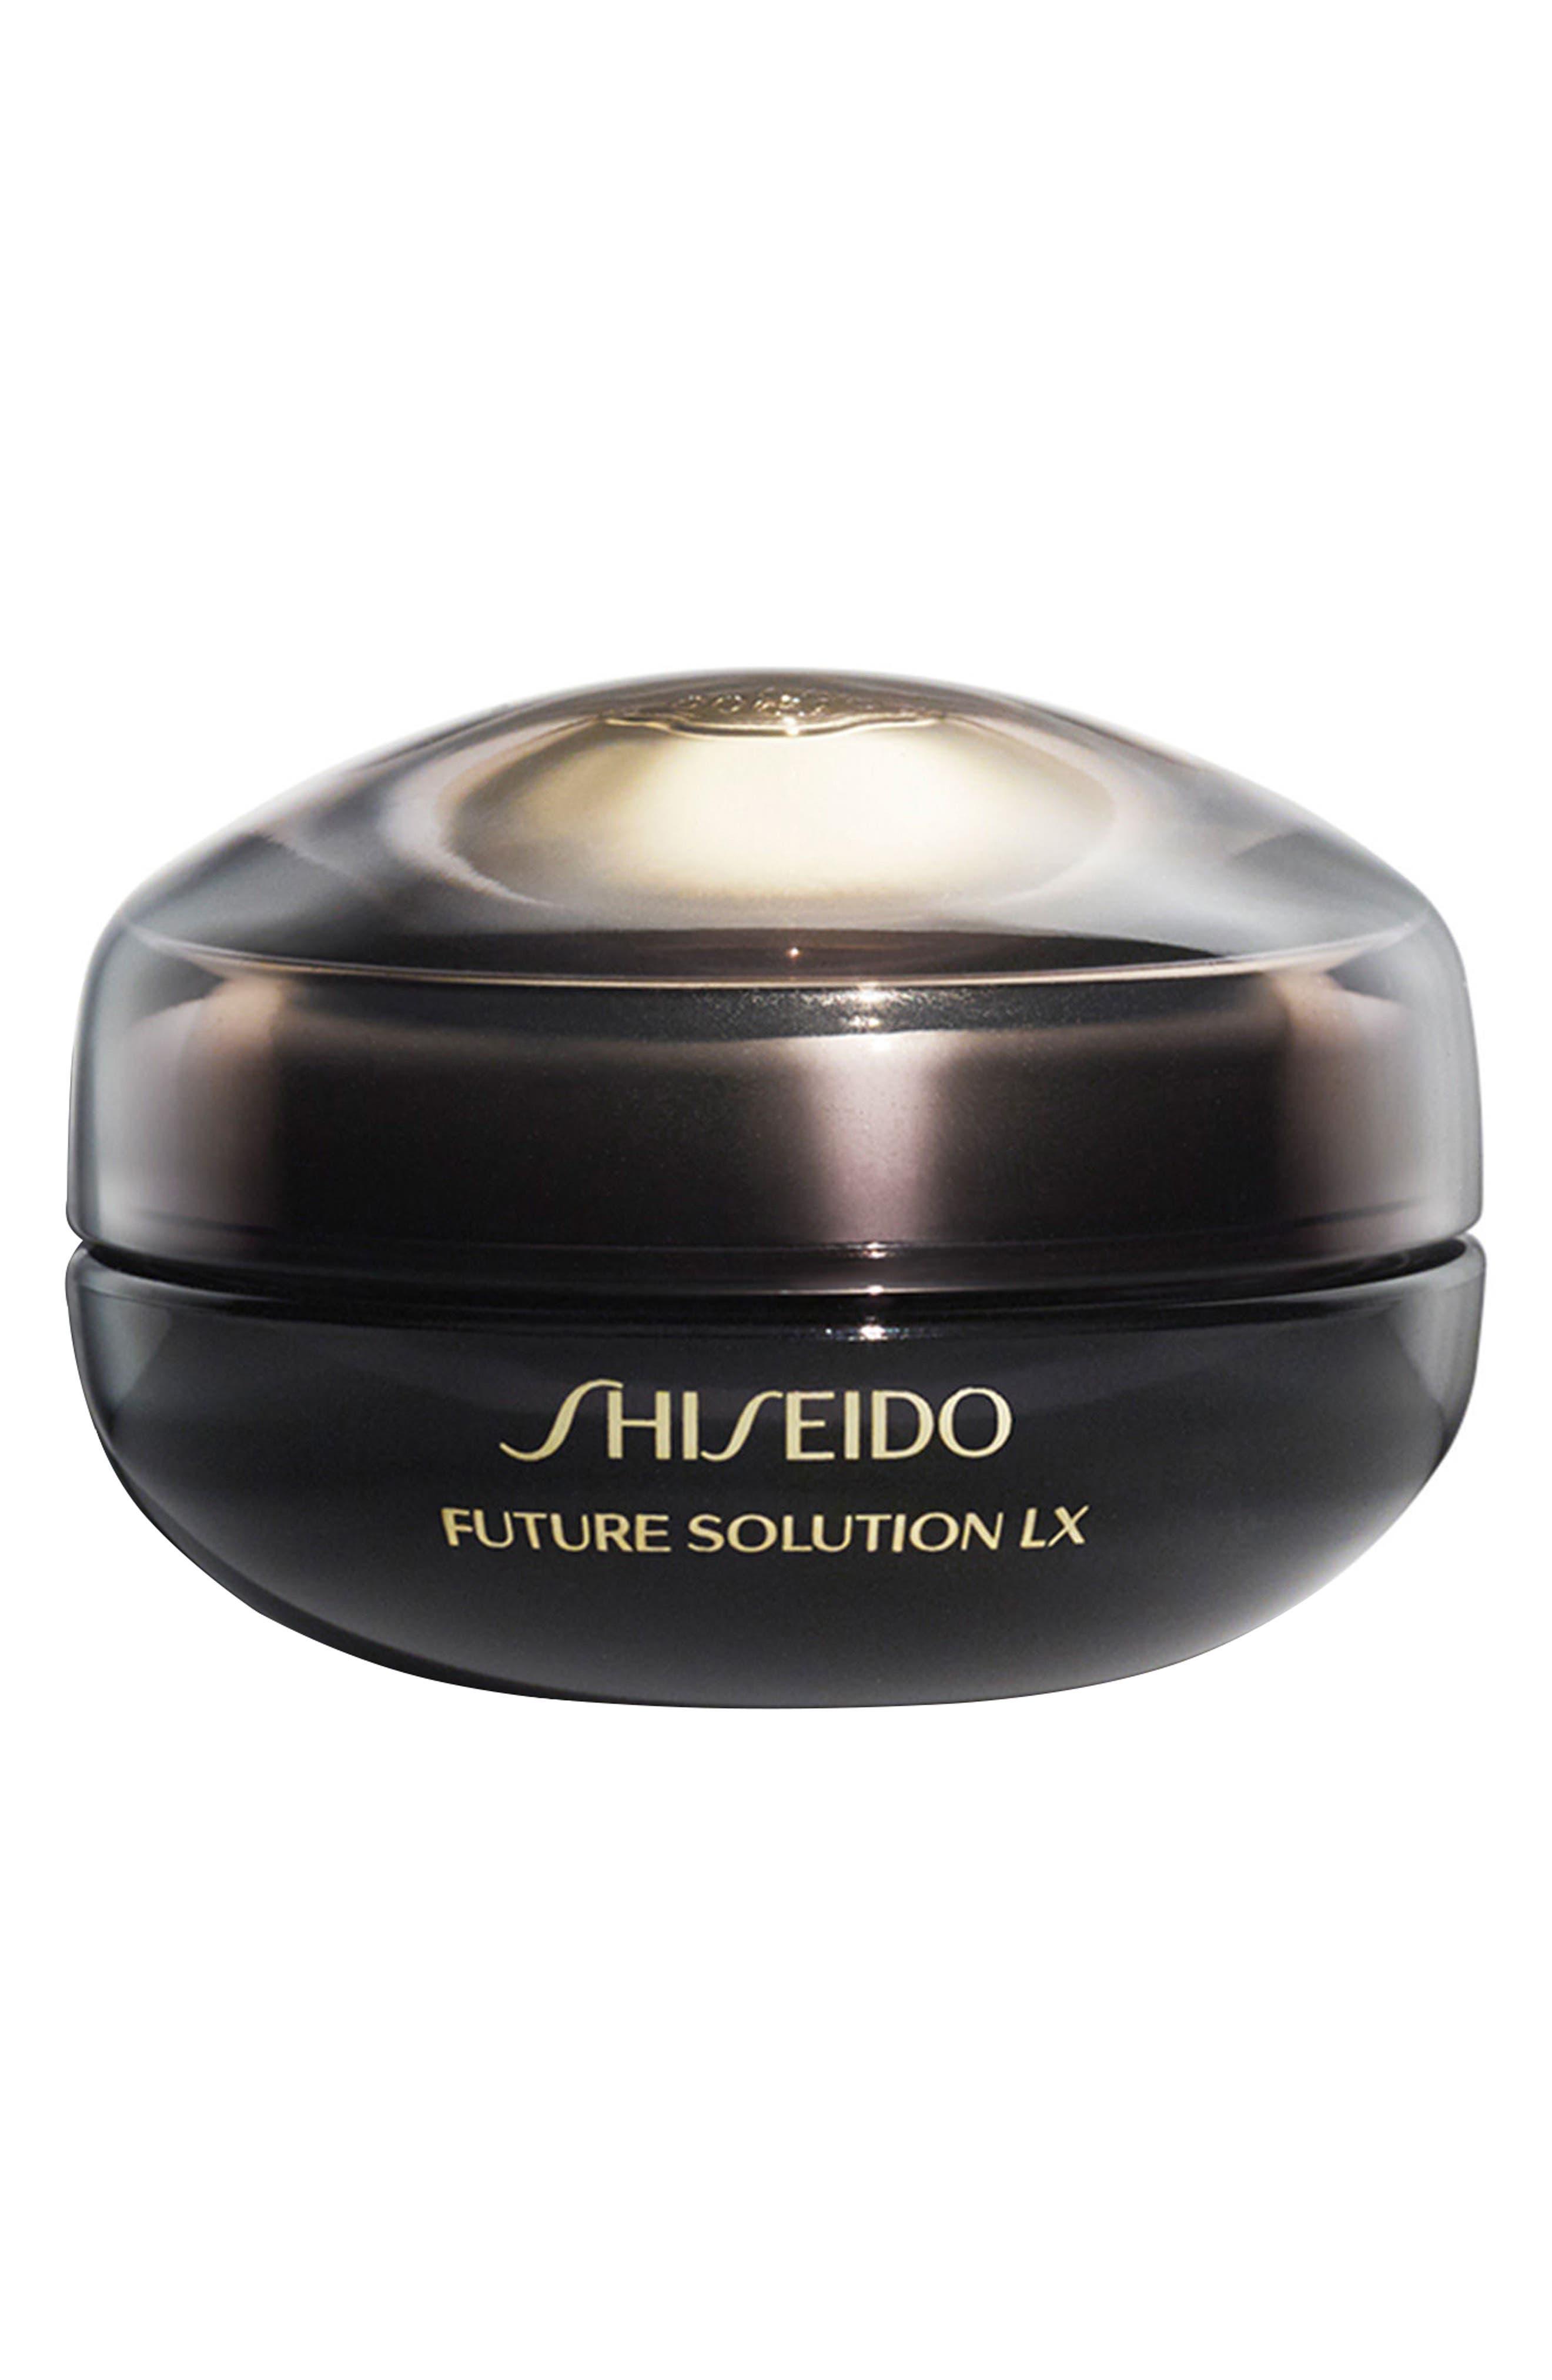 SHISEIDO, Future Solution LX Eye & Lip Contour Regenerating Cream, Main thumbnail 1, color, NO COLOR